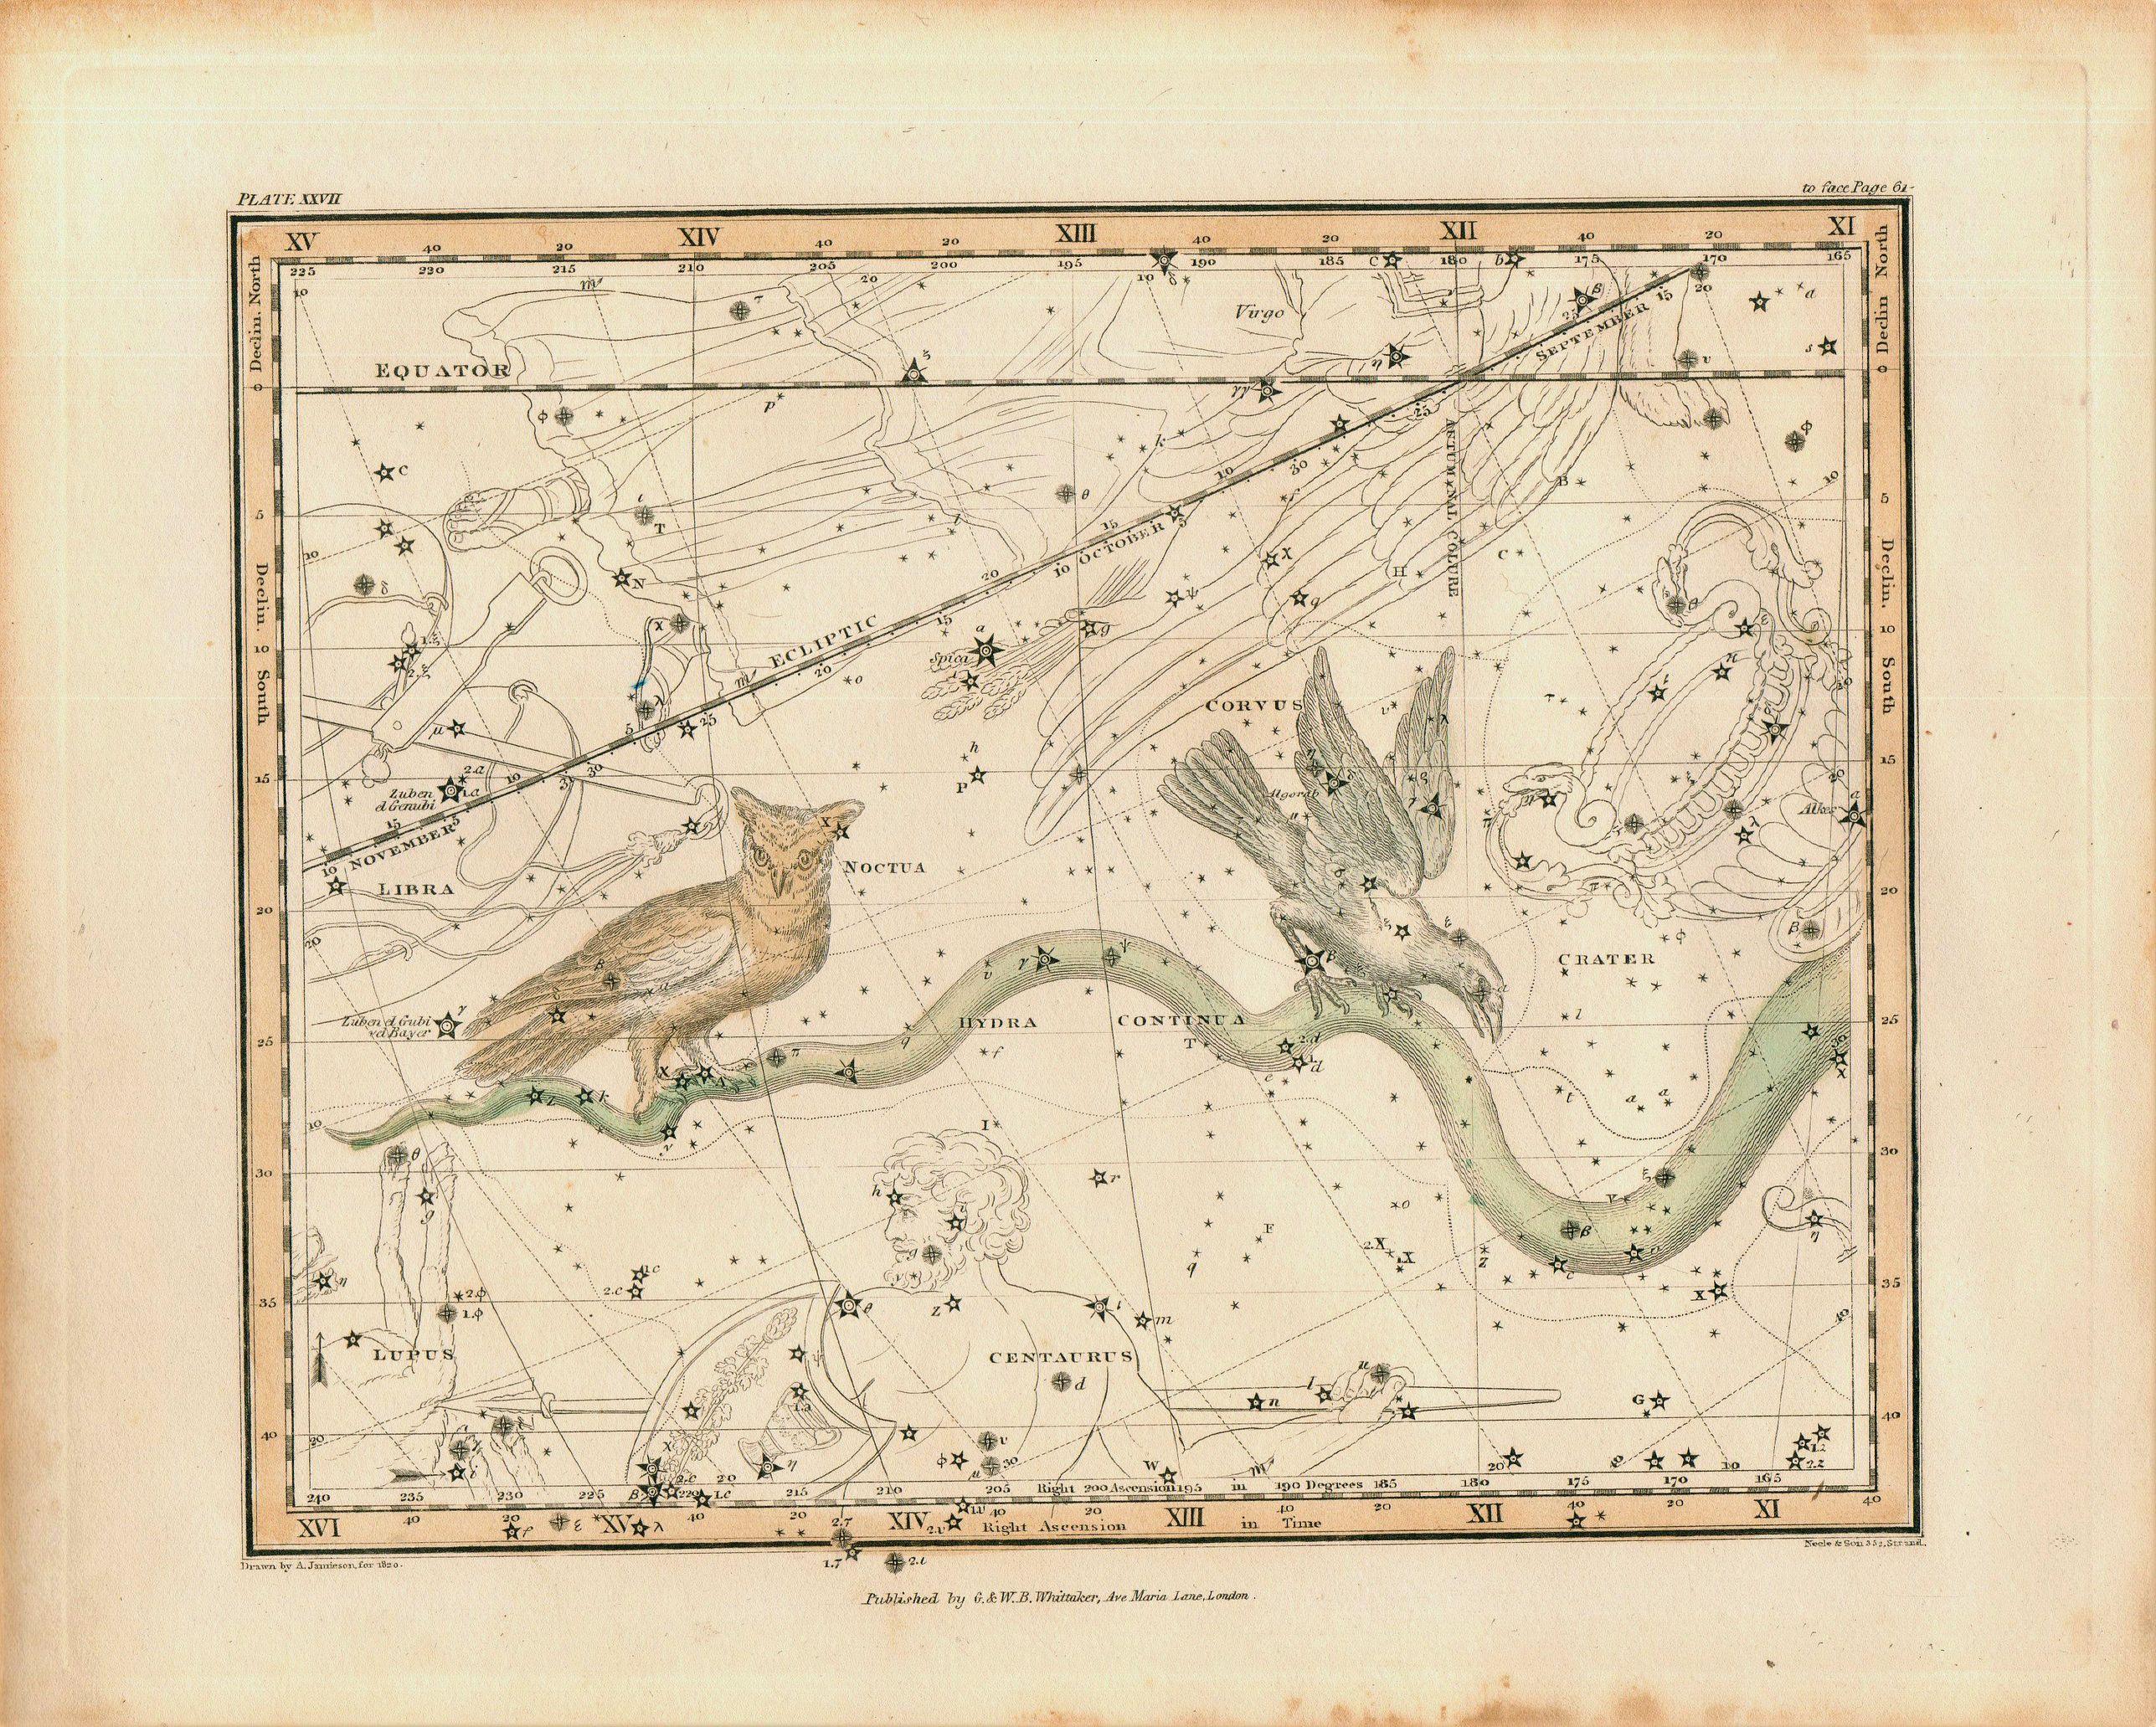 JAMIESON, Alexander - Jamieson Celestial chart plate 27 first edition.